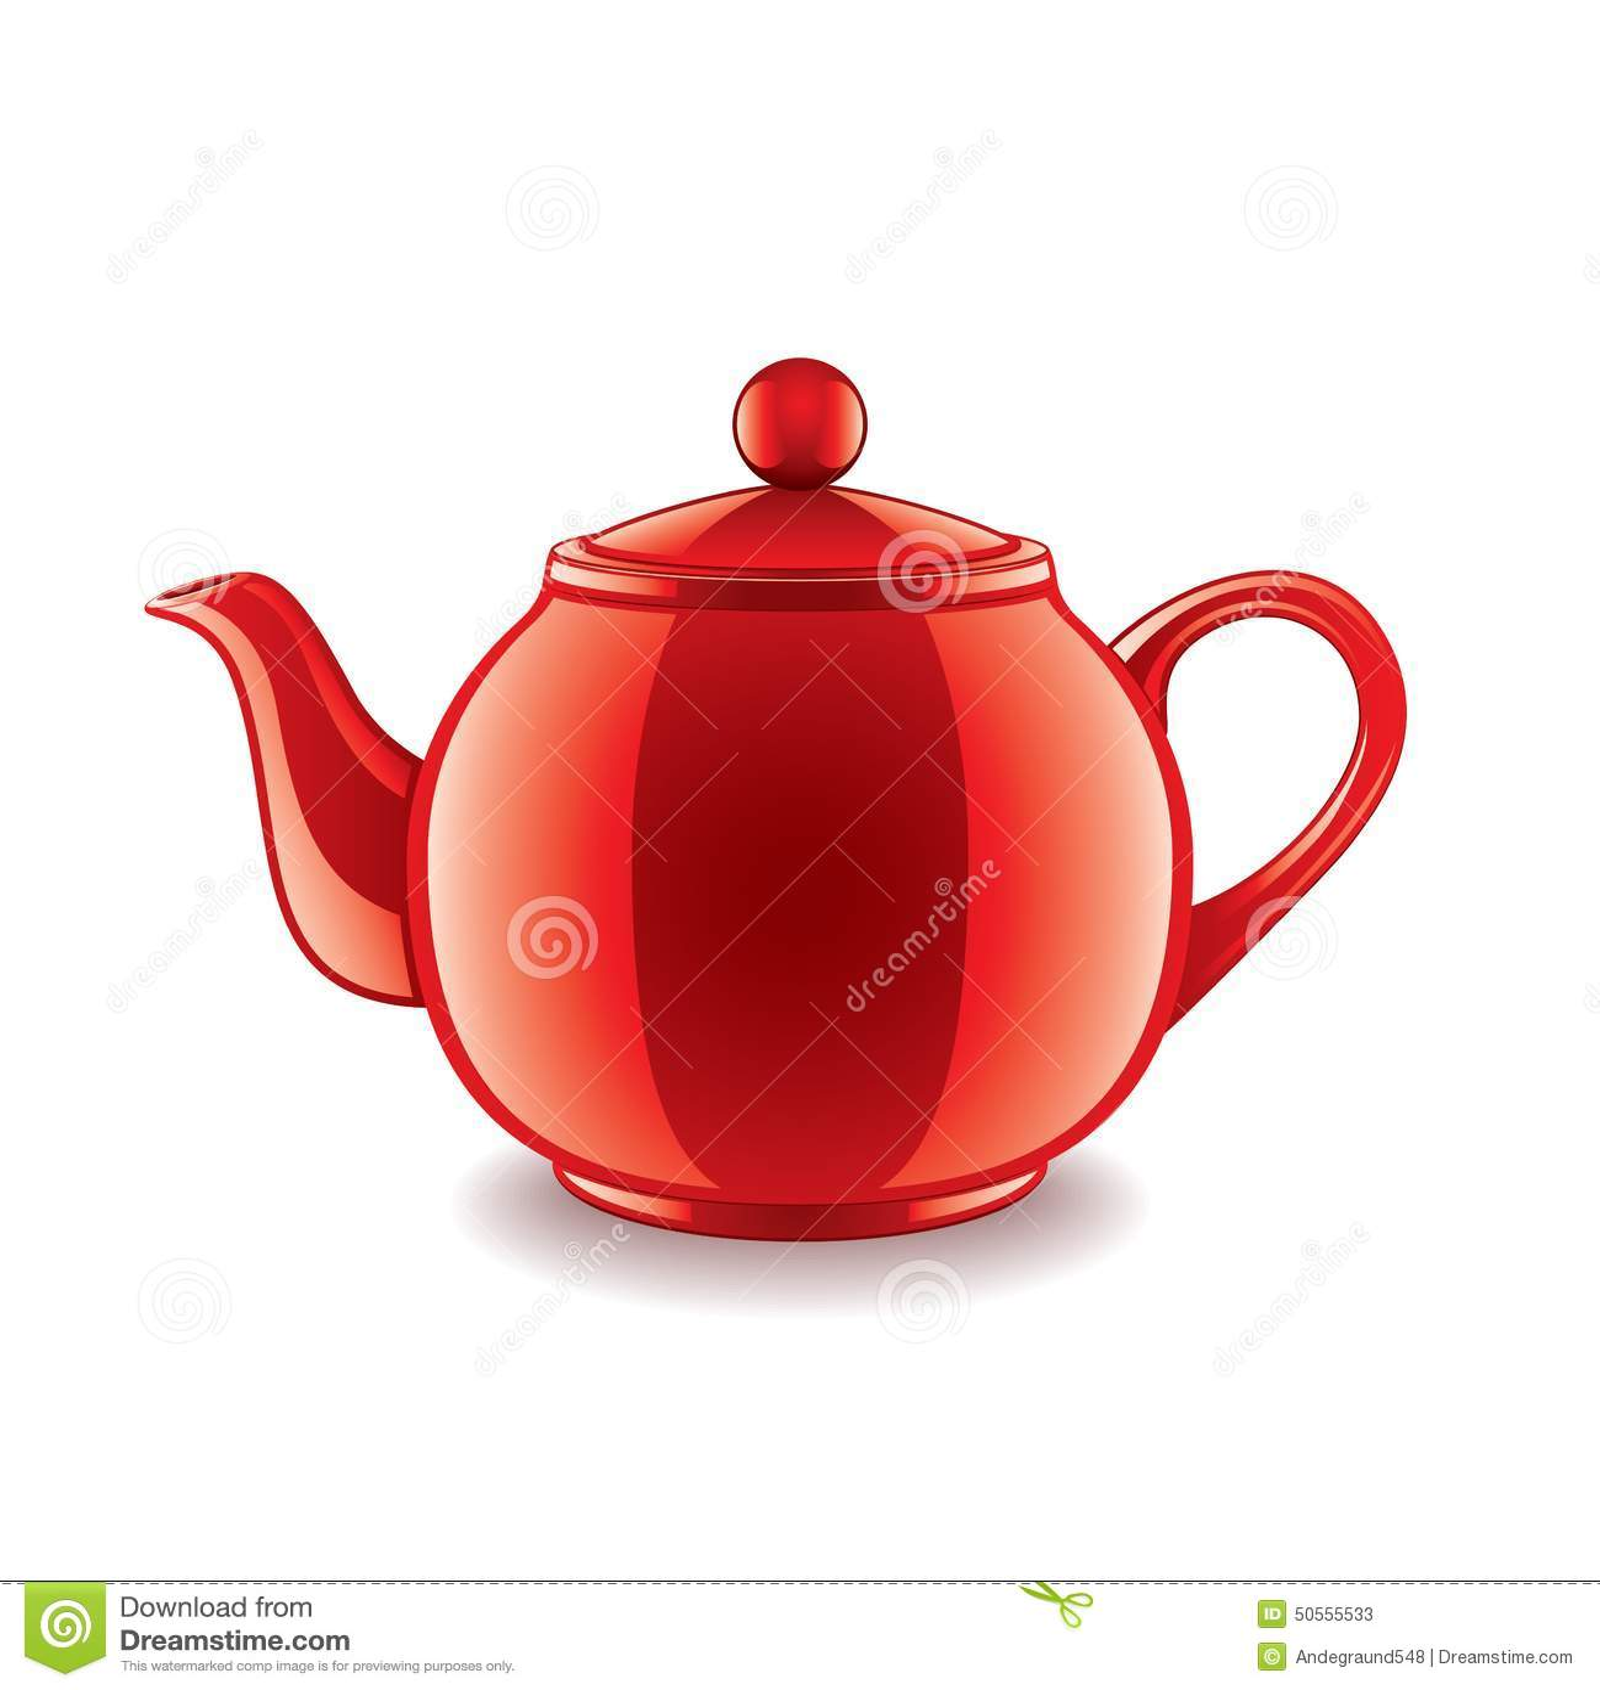 Ceramic Teapot On White Vector Stock Vector - Image: 50555533